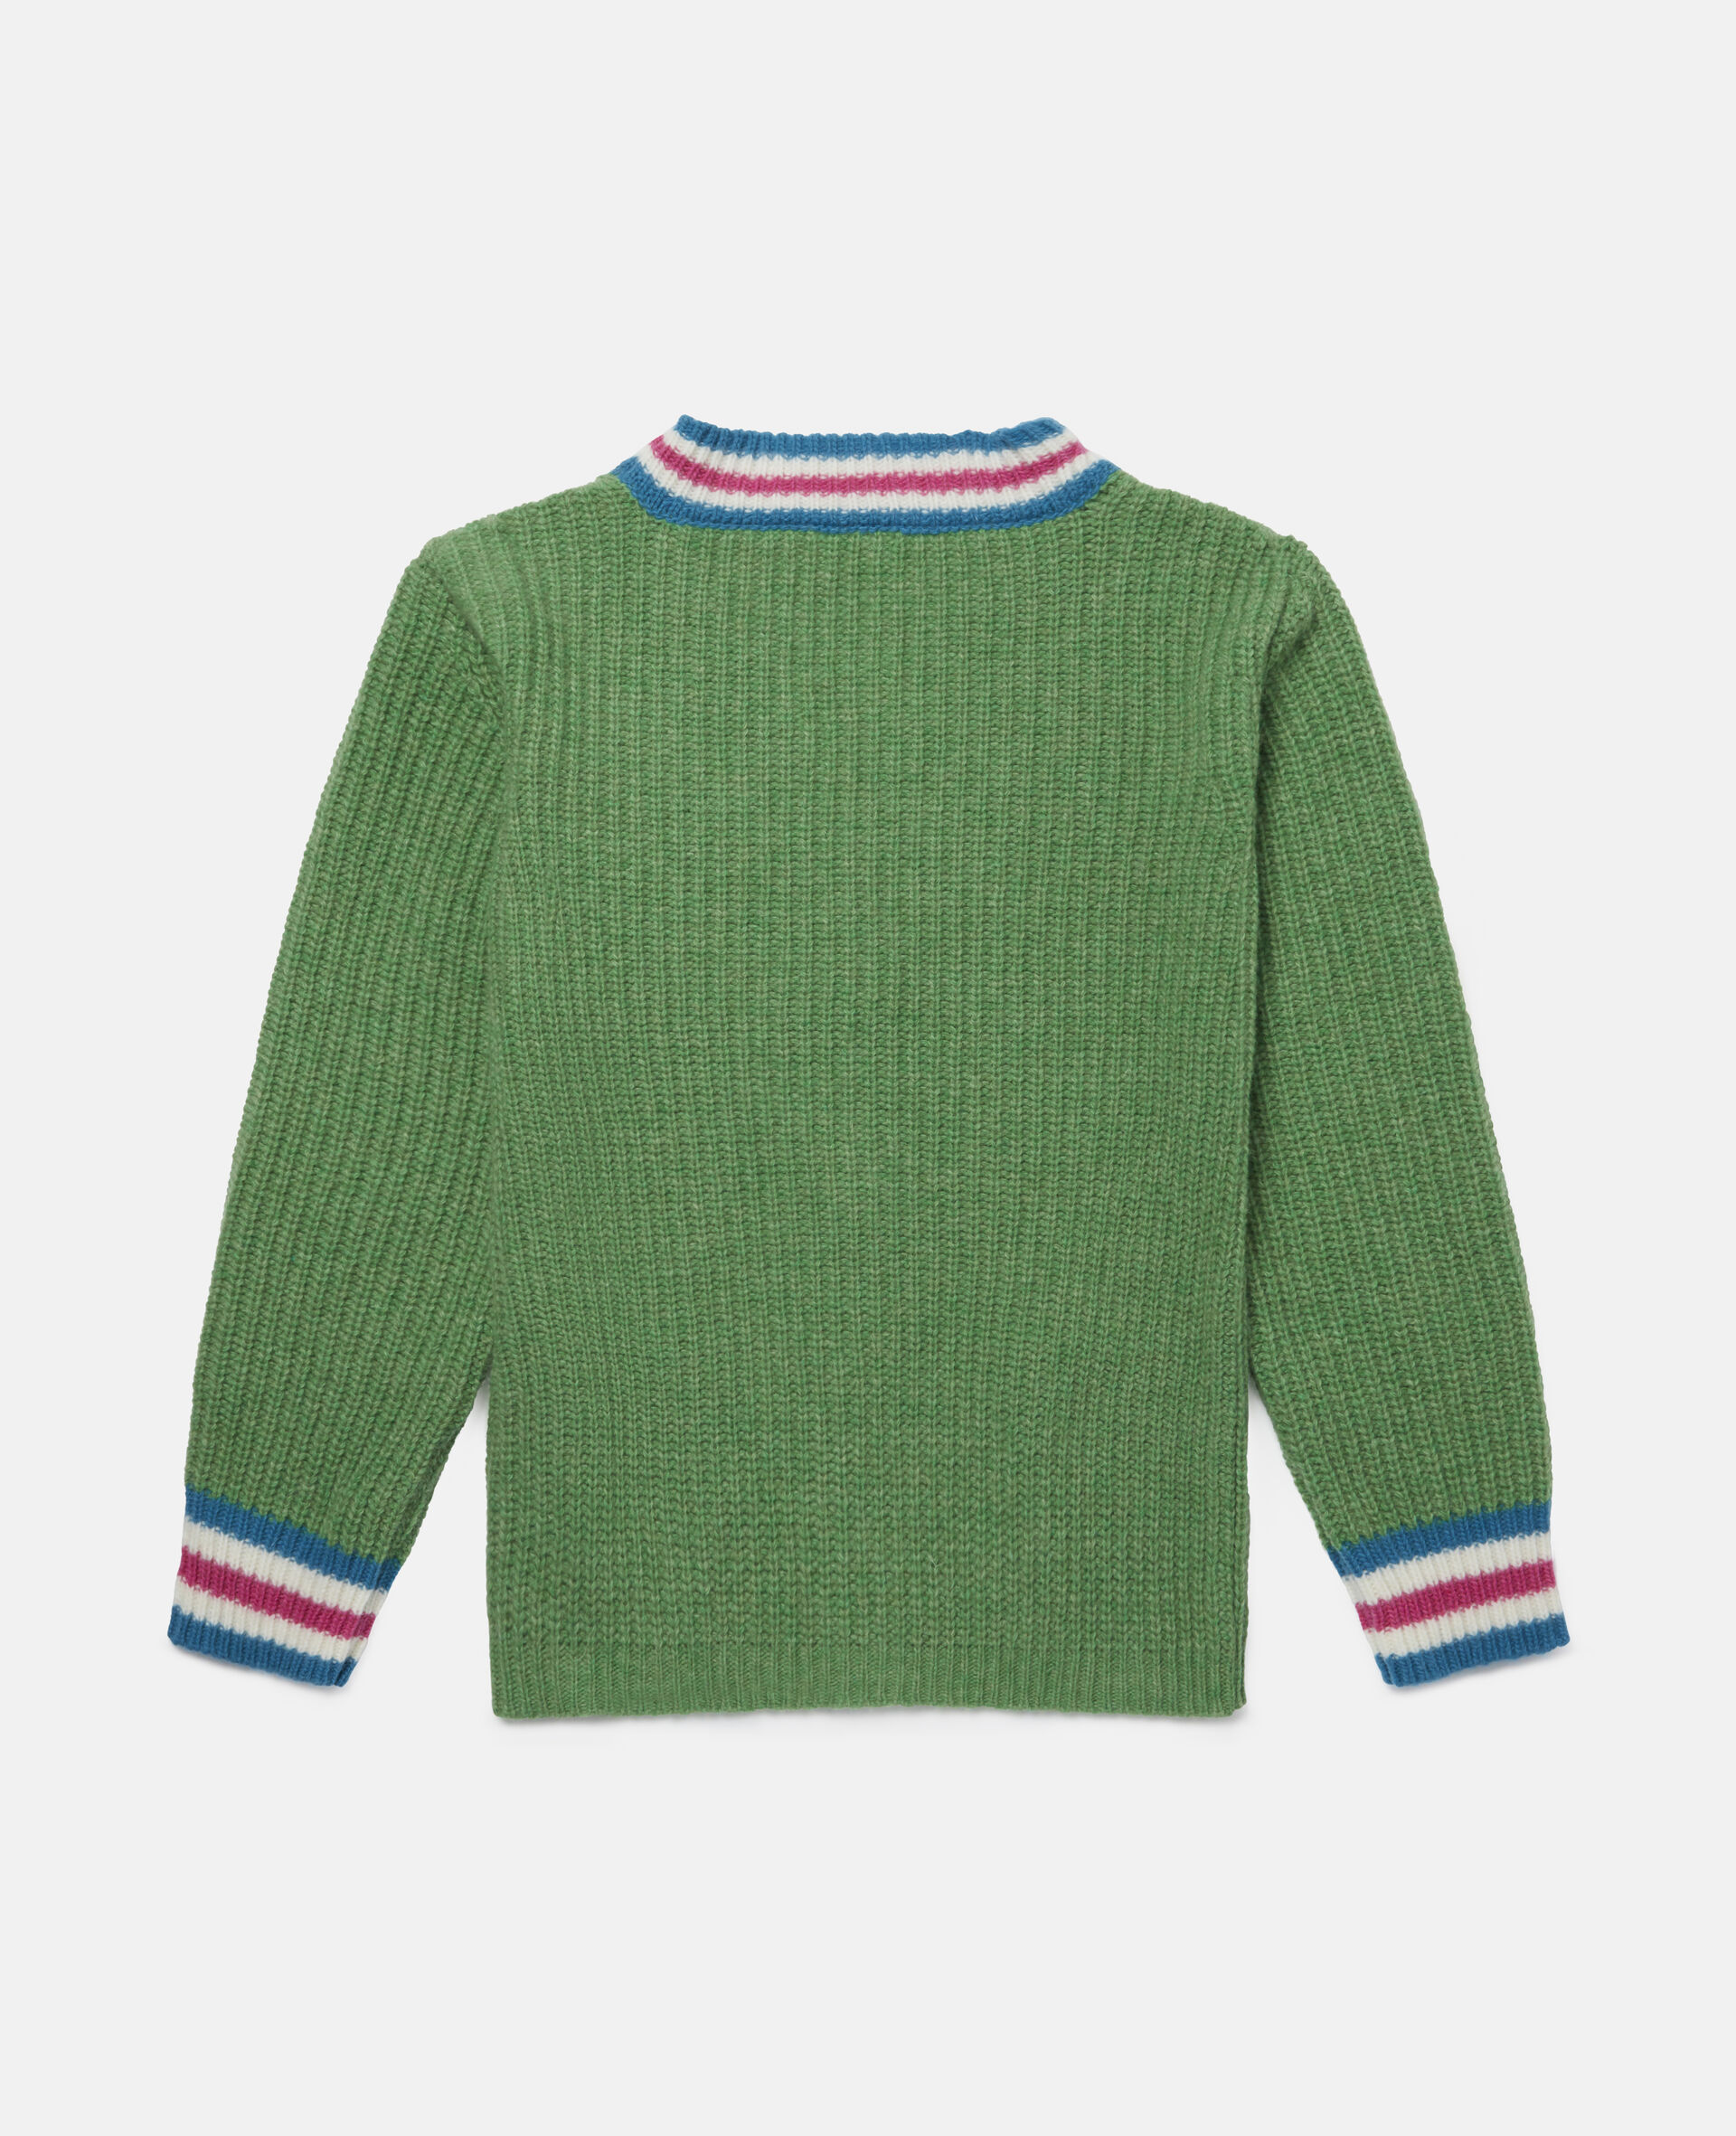 Pencils Knit Intarsia Cardigan -Green-large image number 3